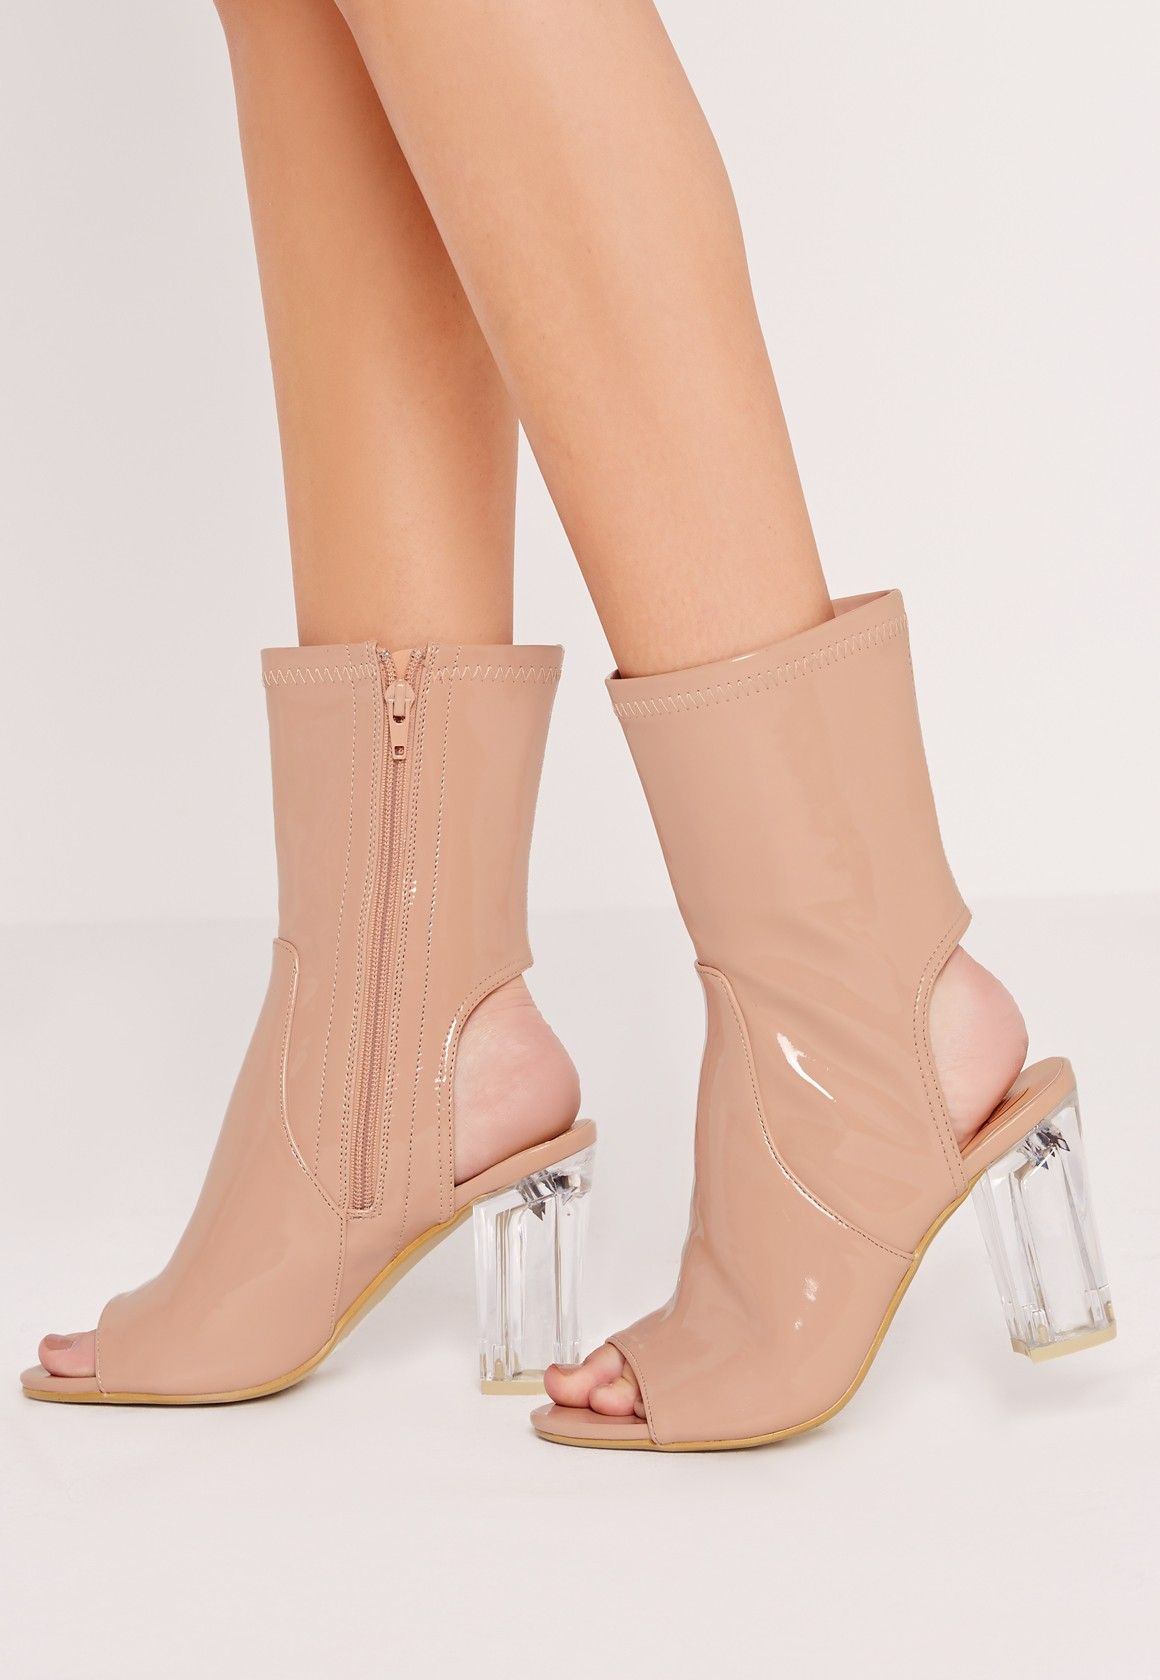 1ea0b9e412c Missguided - Peep Toe Perspex Block Heel Perspex Heel Nude   Style ...